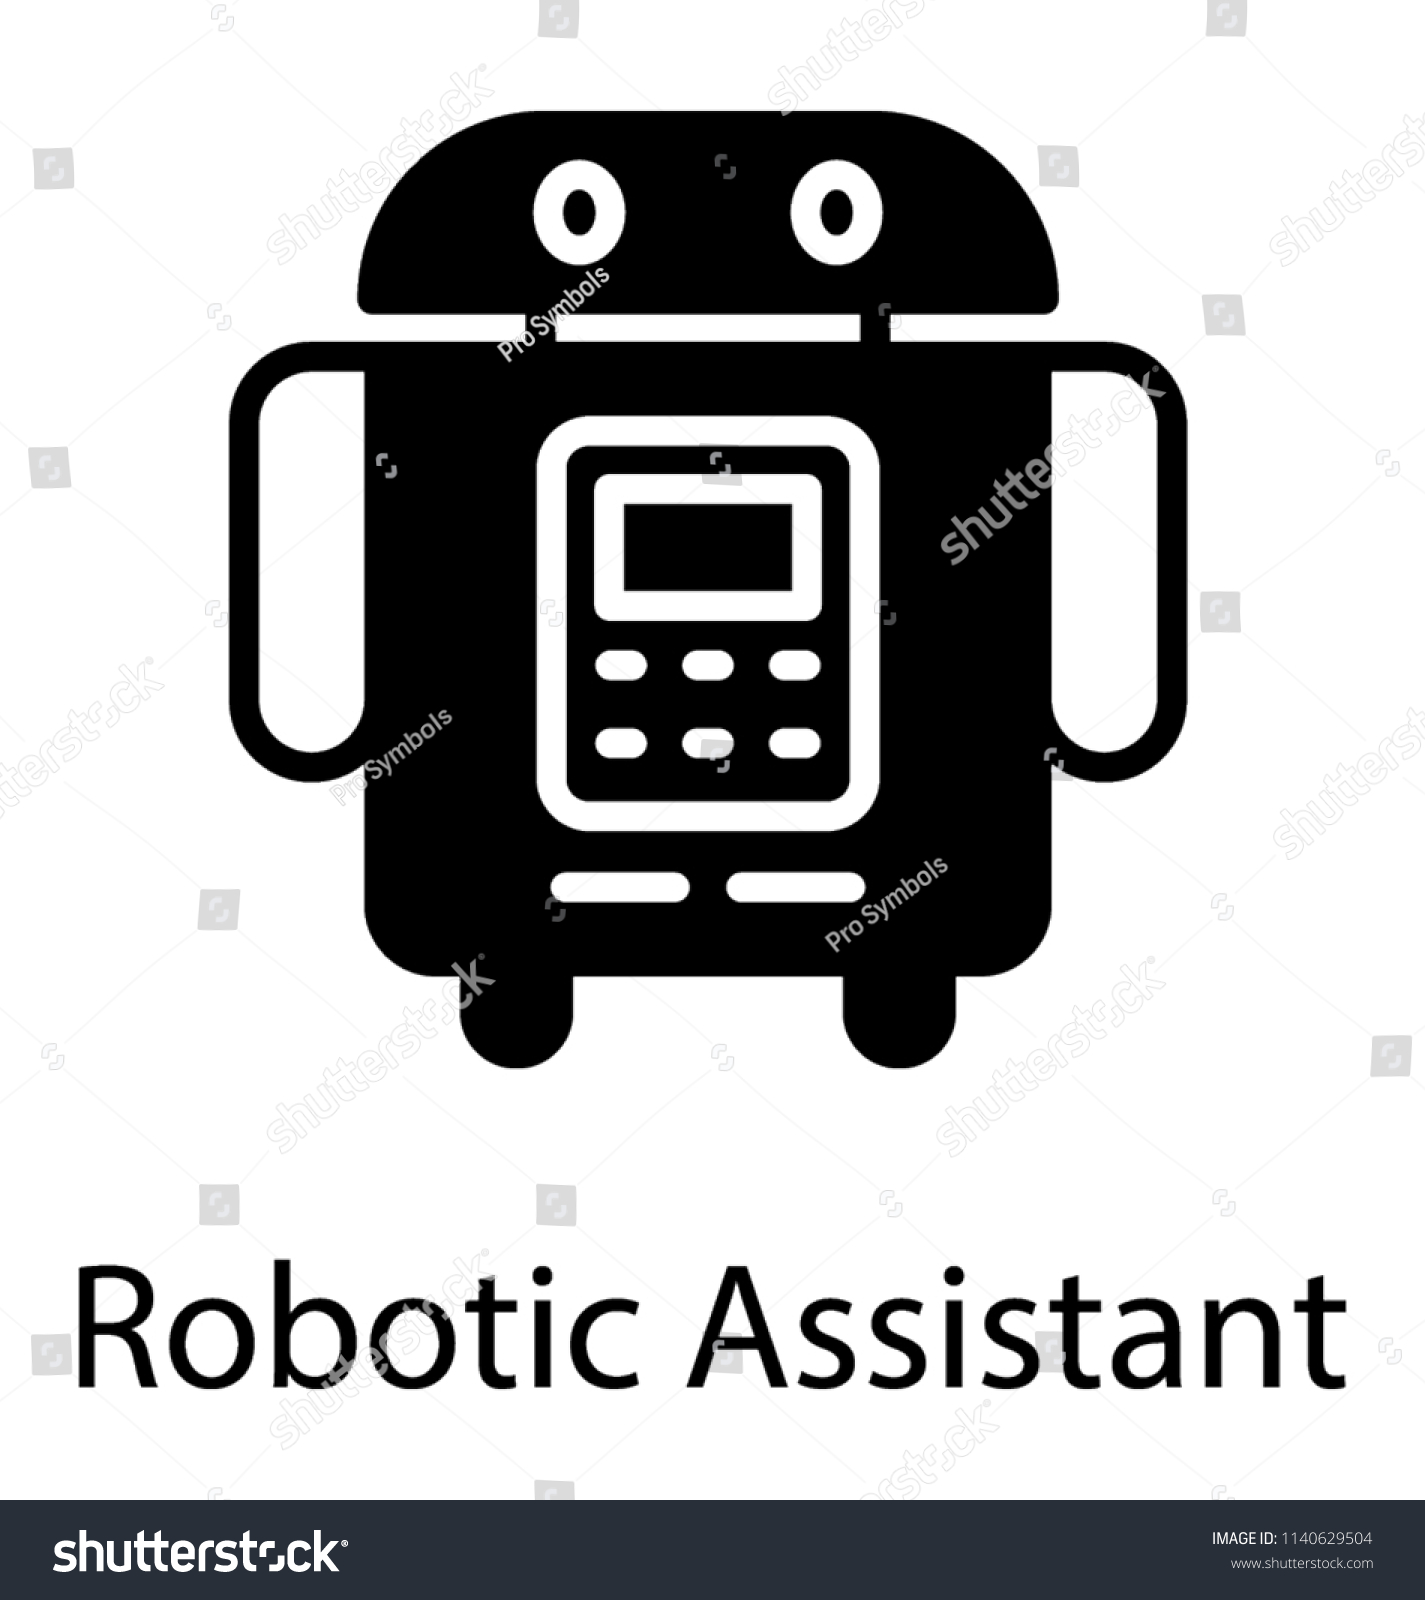 Cartoon Personal Robot Vector Icon Graphic Stock Vector